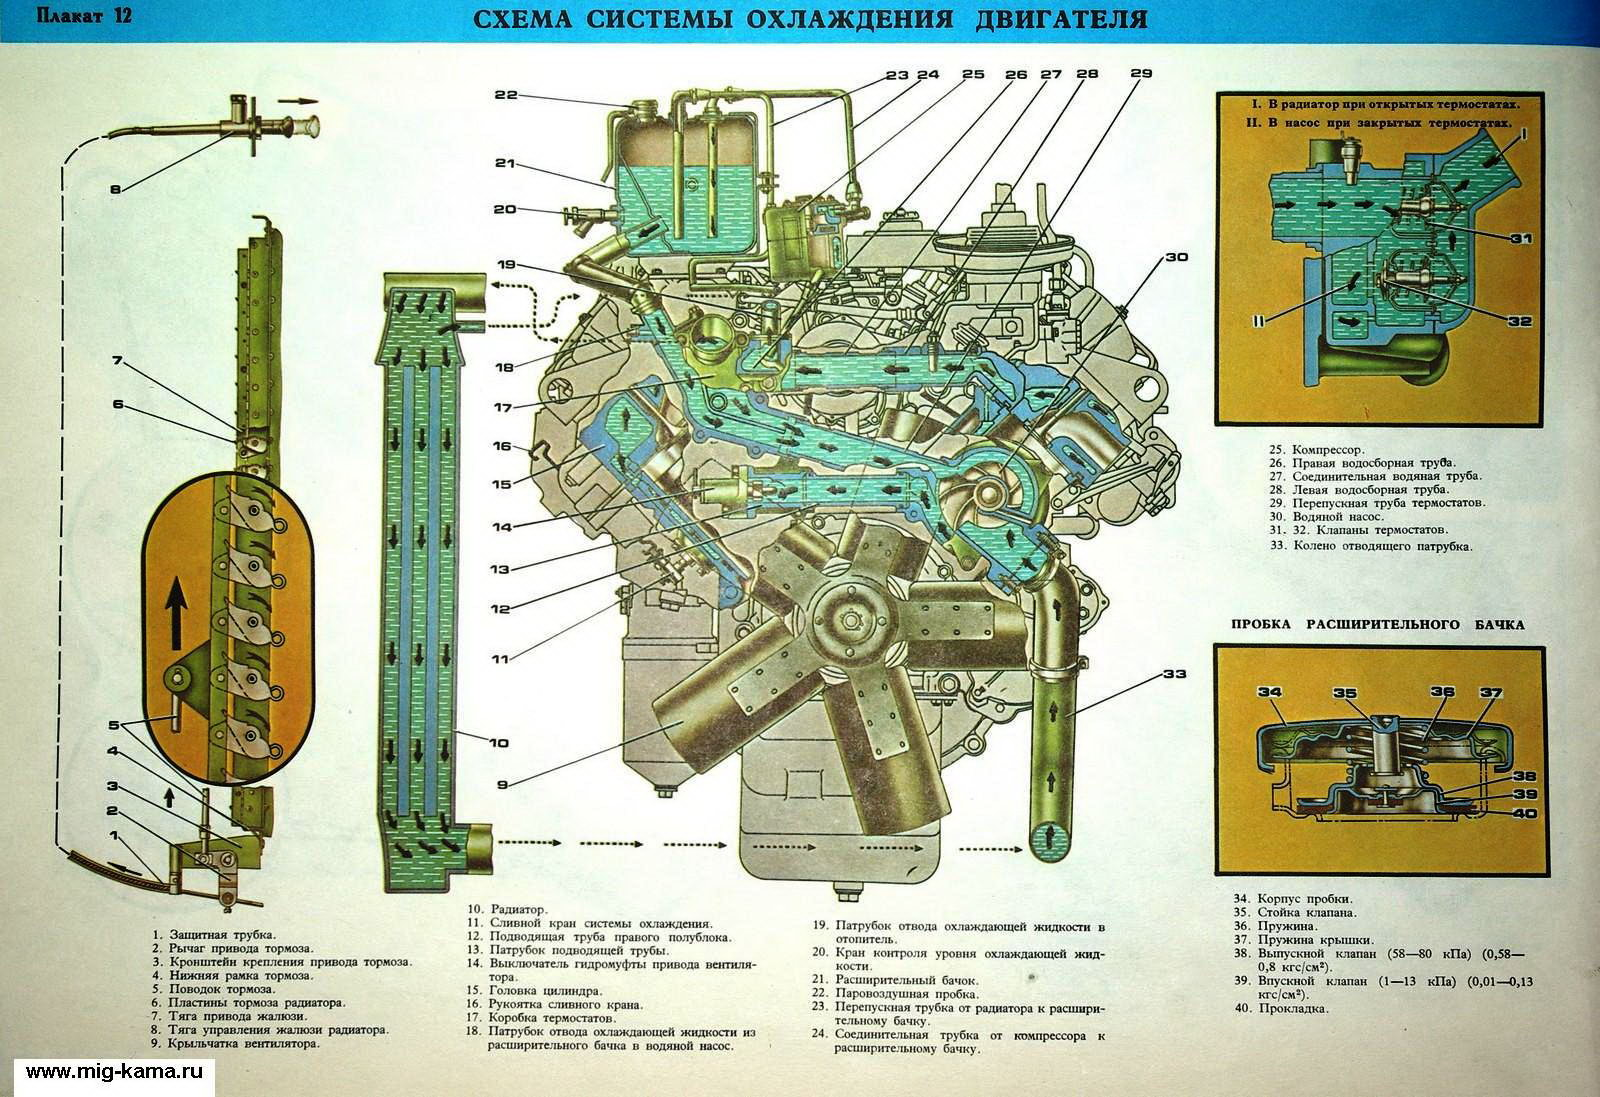 Система смазки двигателя камаз схема